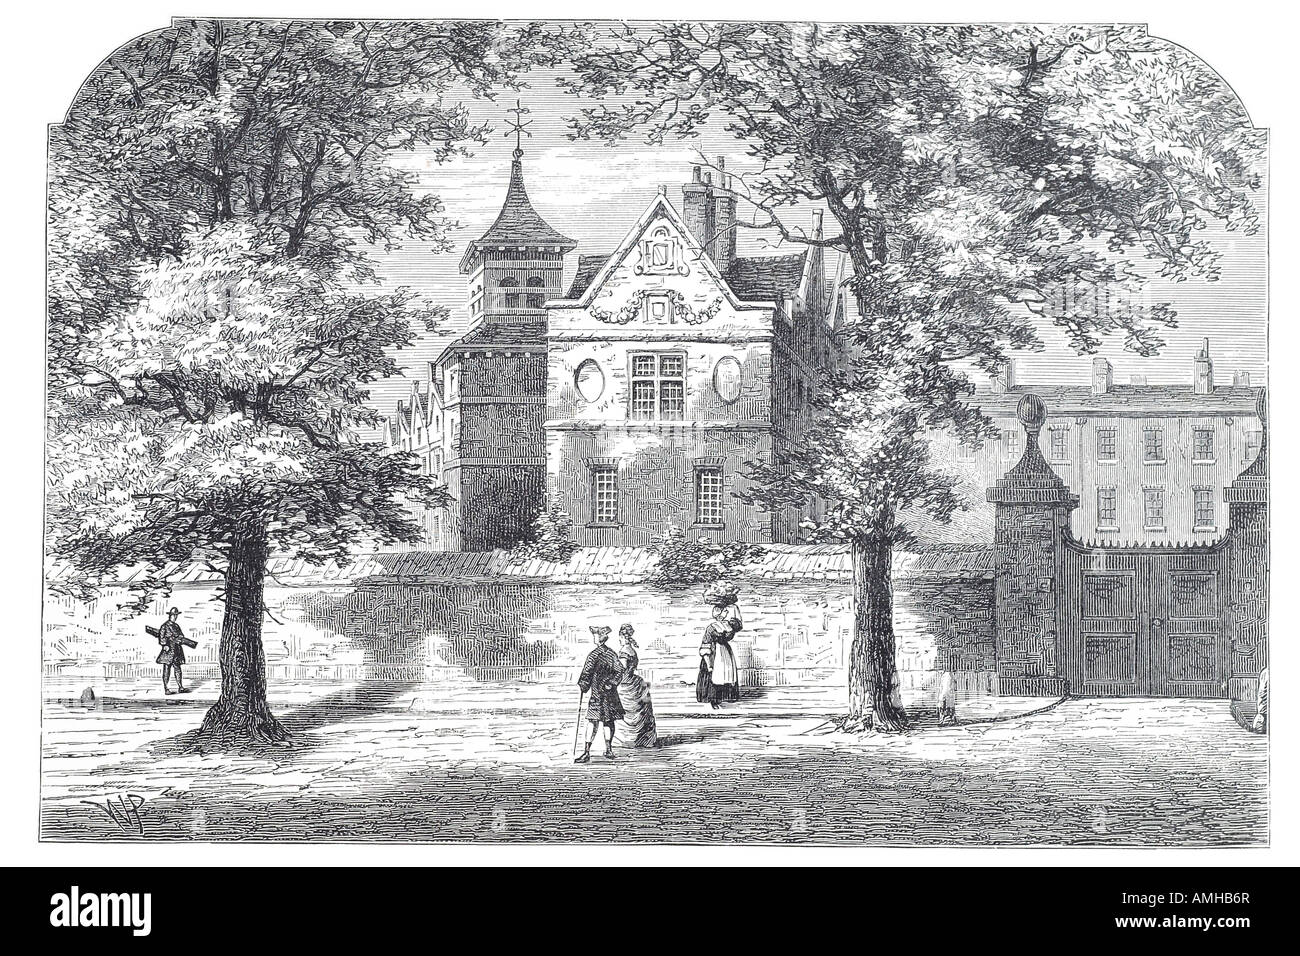 1780 marylebone school house education Central City royal urban London Greater capital England English Britain British - Stock Image